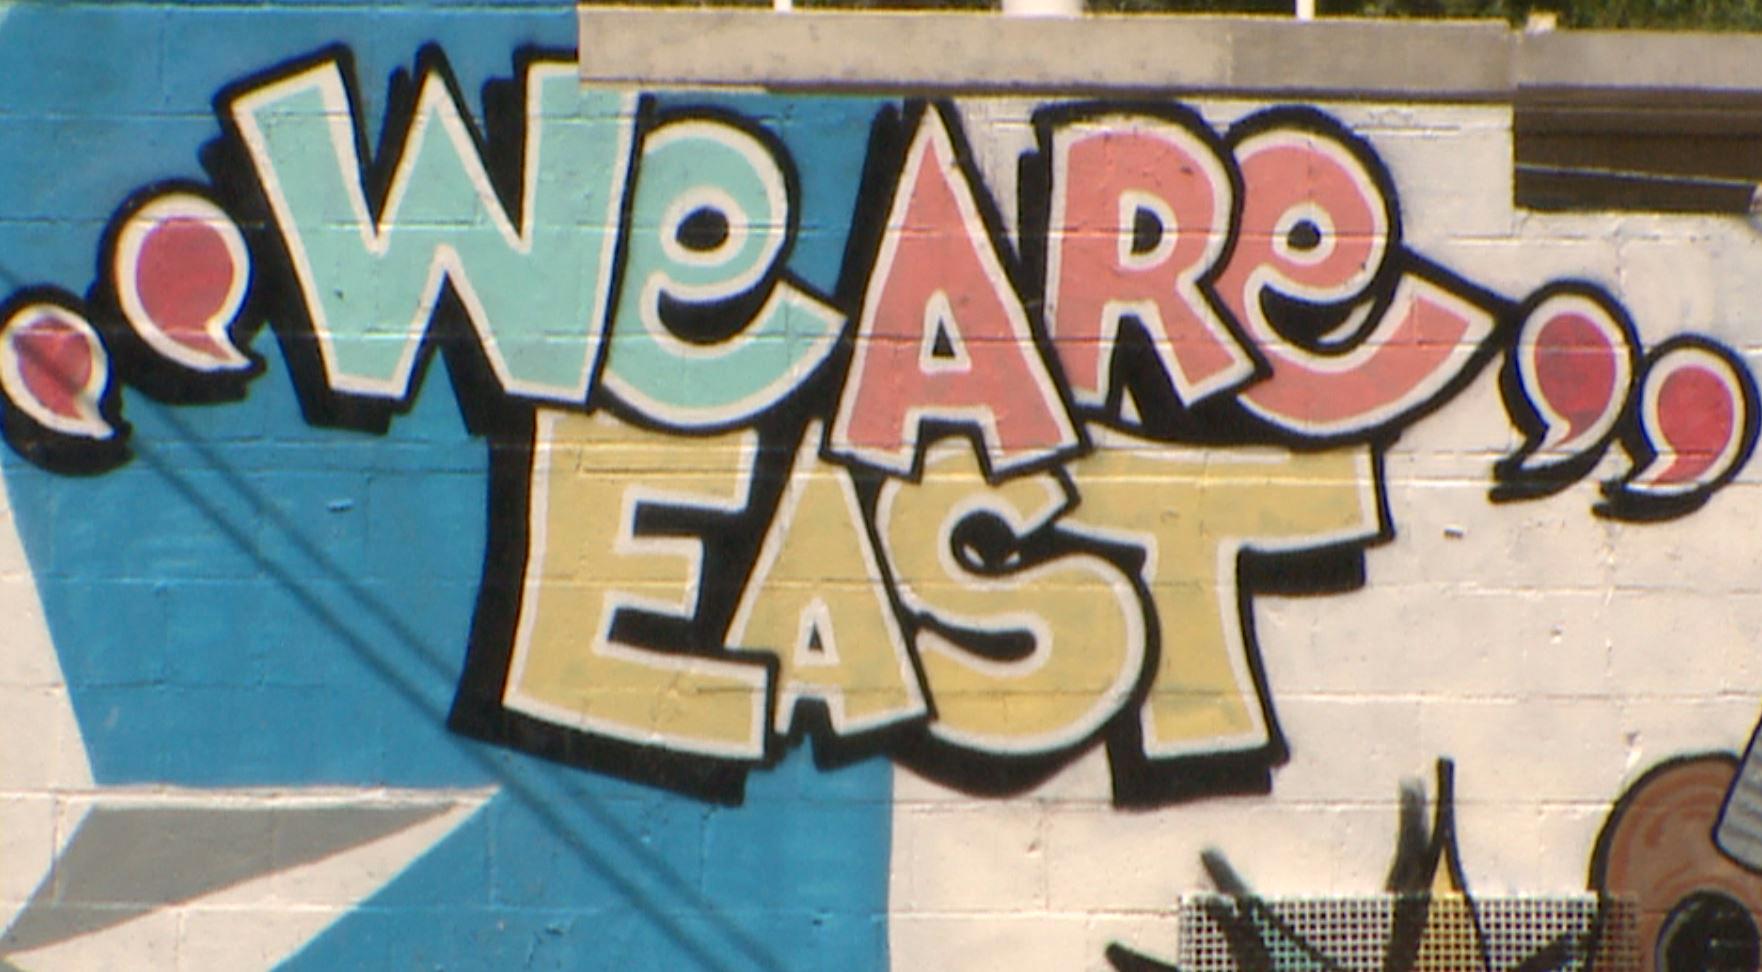 East Austin_345889